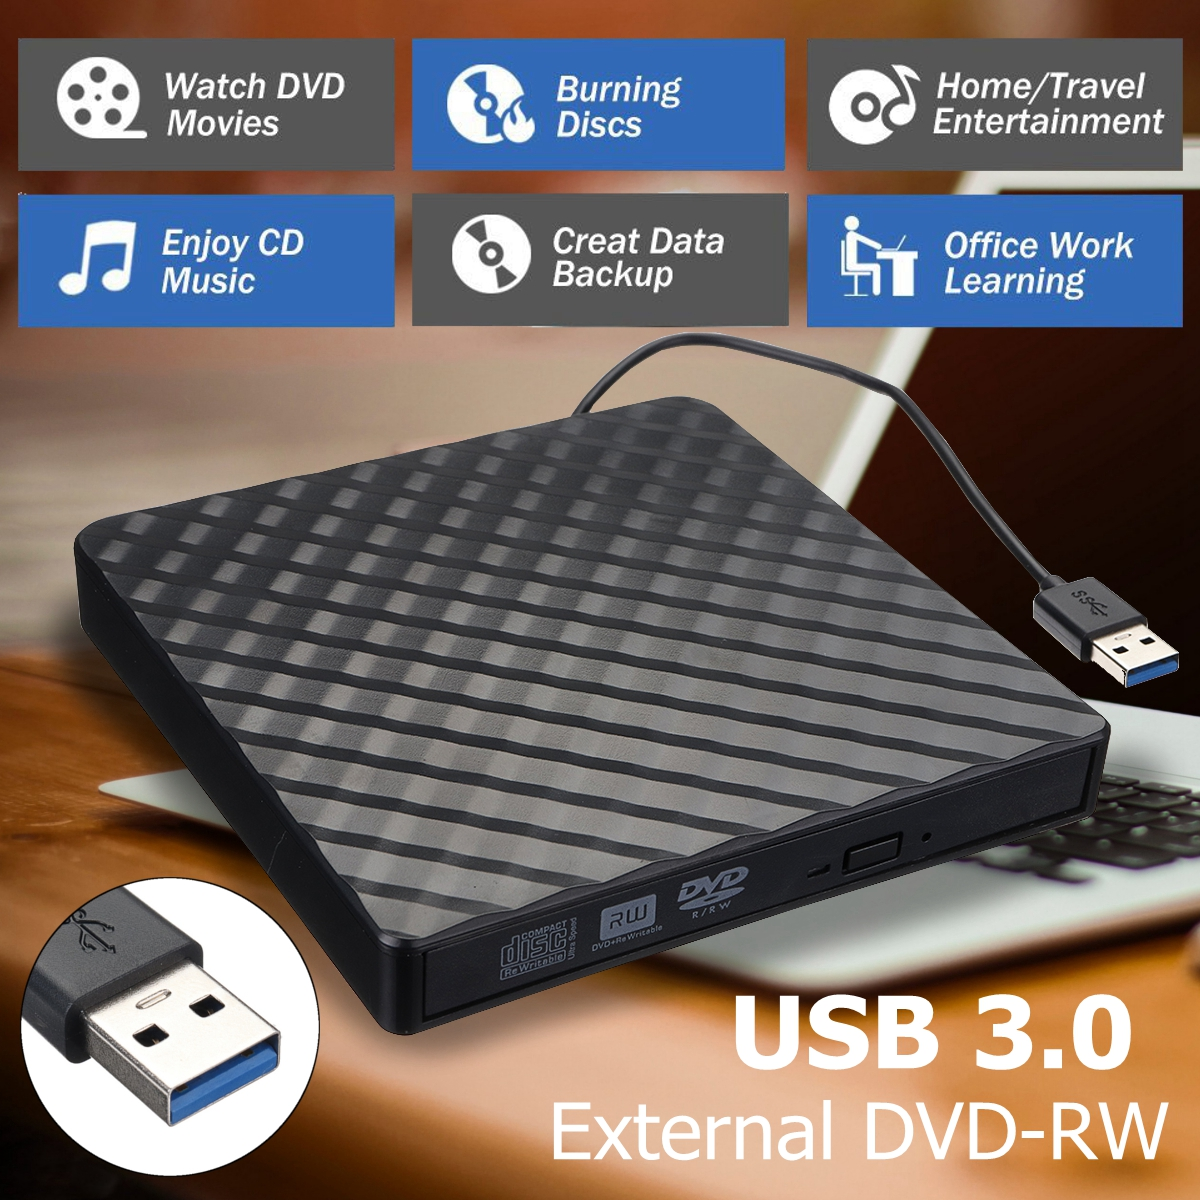 External USB3.0 DVD RW CD Writer Slim Optical Drive Burner Reader Player Tray Type Portable For PC Laptop